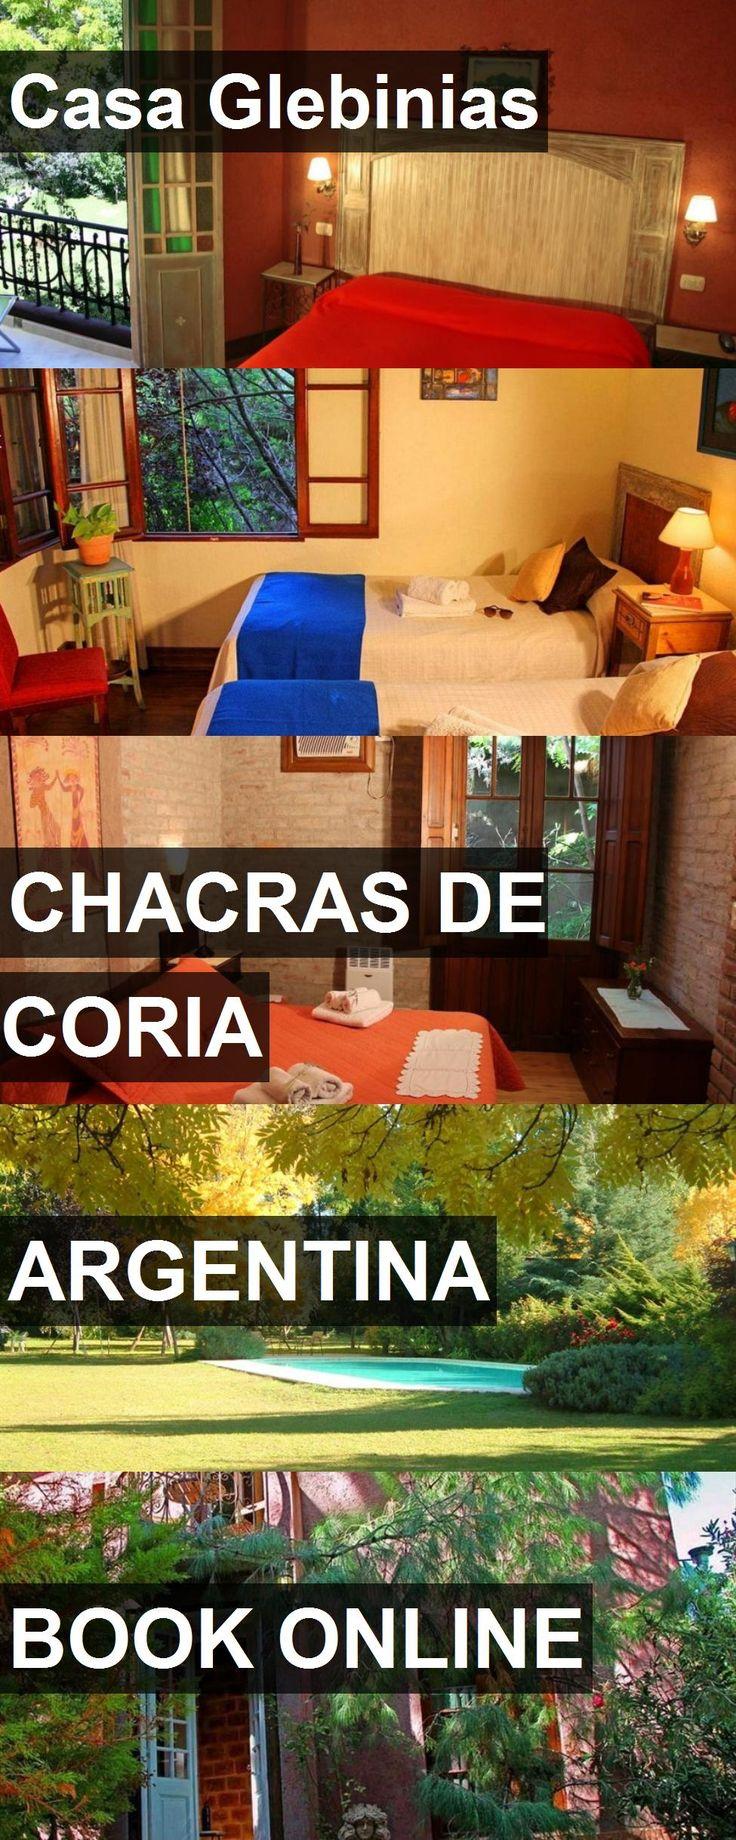 Hotel Casa Glebinias in Chacras de Coria, Argentina. For more information, photos, reviews and best prices please follow the link. #Argentina #ChacrasdeCoria #CasaGlebinias #hotel #travel #vacation